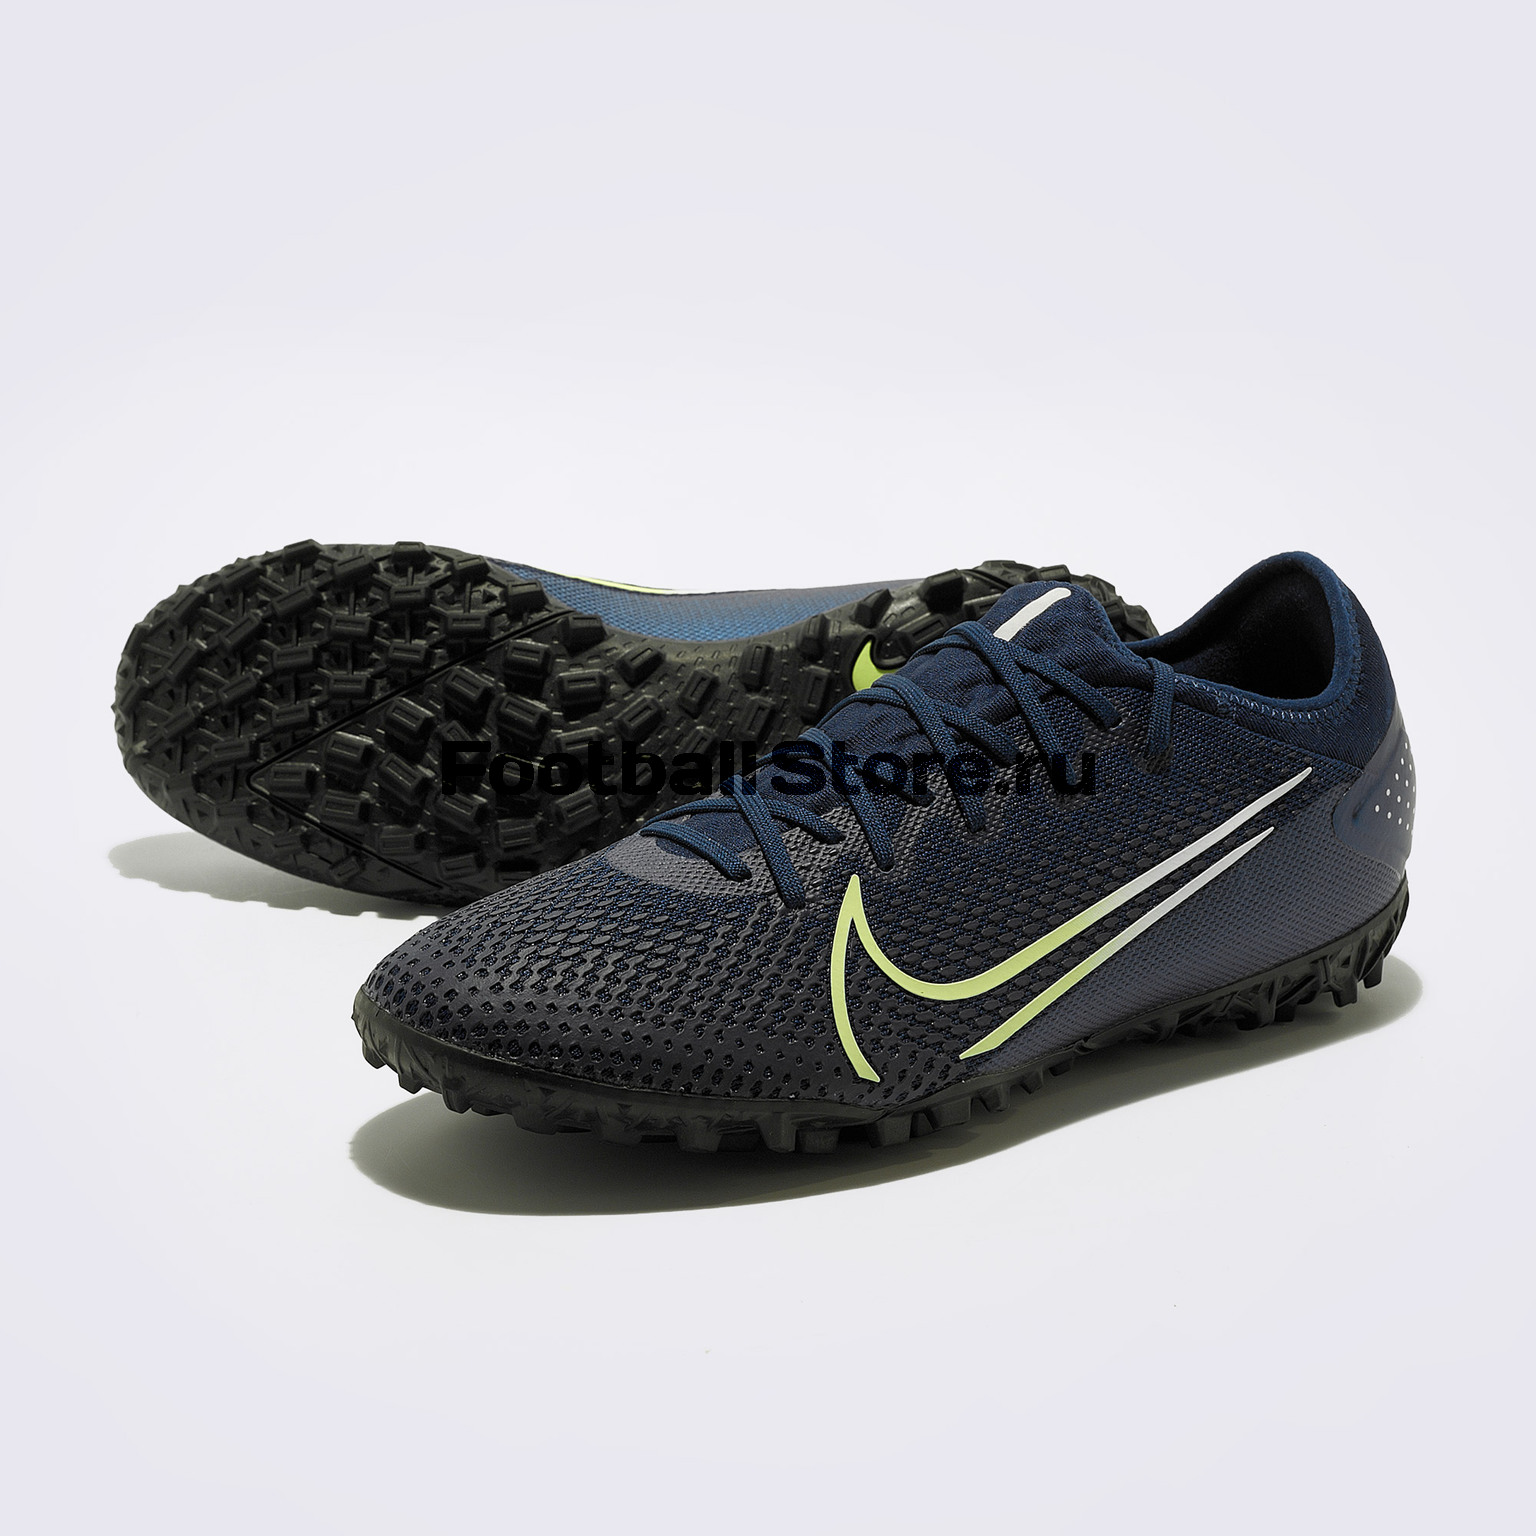 цена на Шиповки Nike Vapor 13 Pro MDS TF CJ1307-401